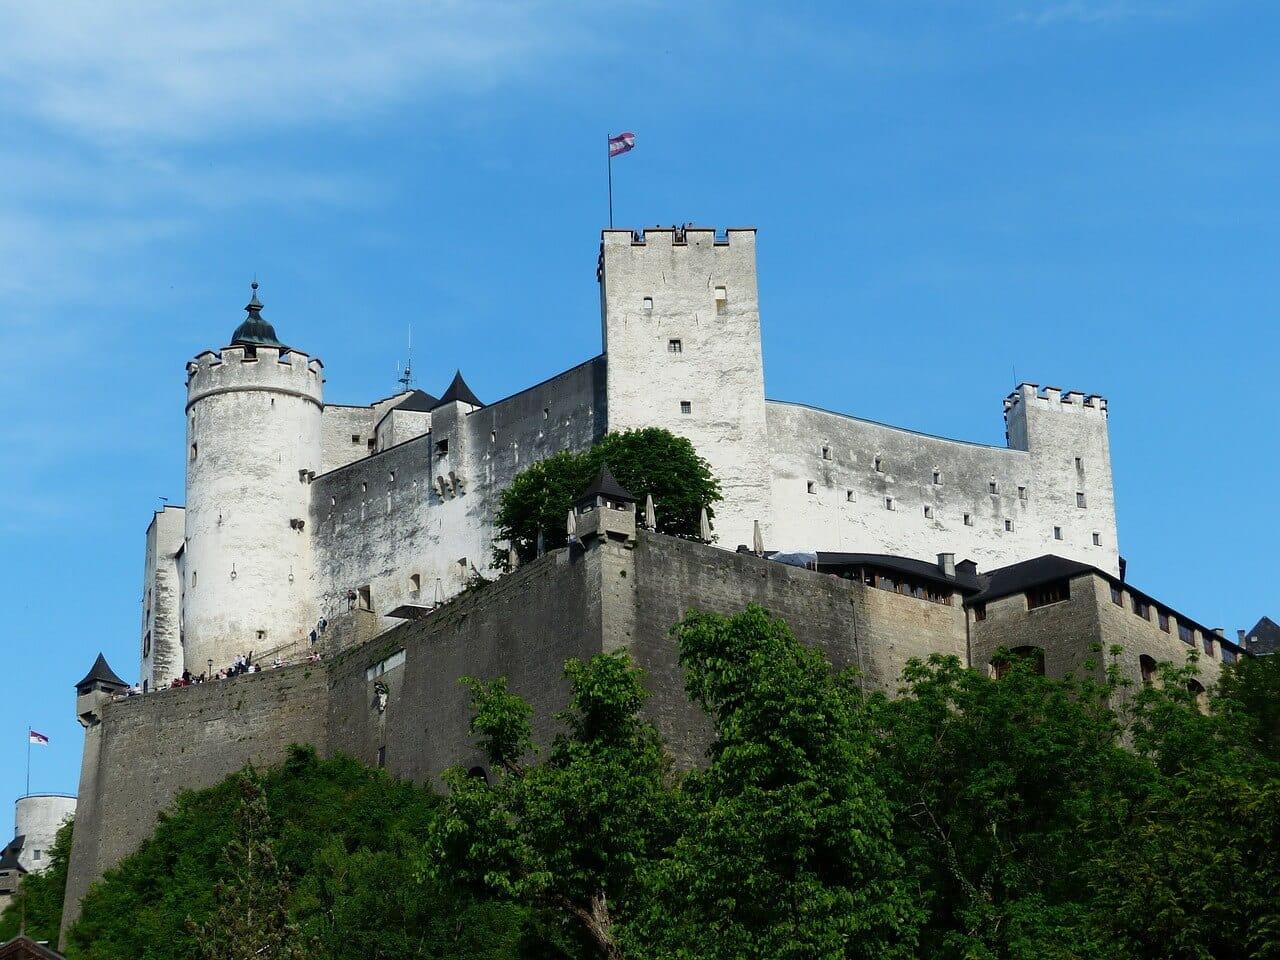 Festung, Hohensalzburg